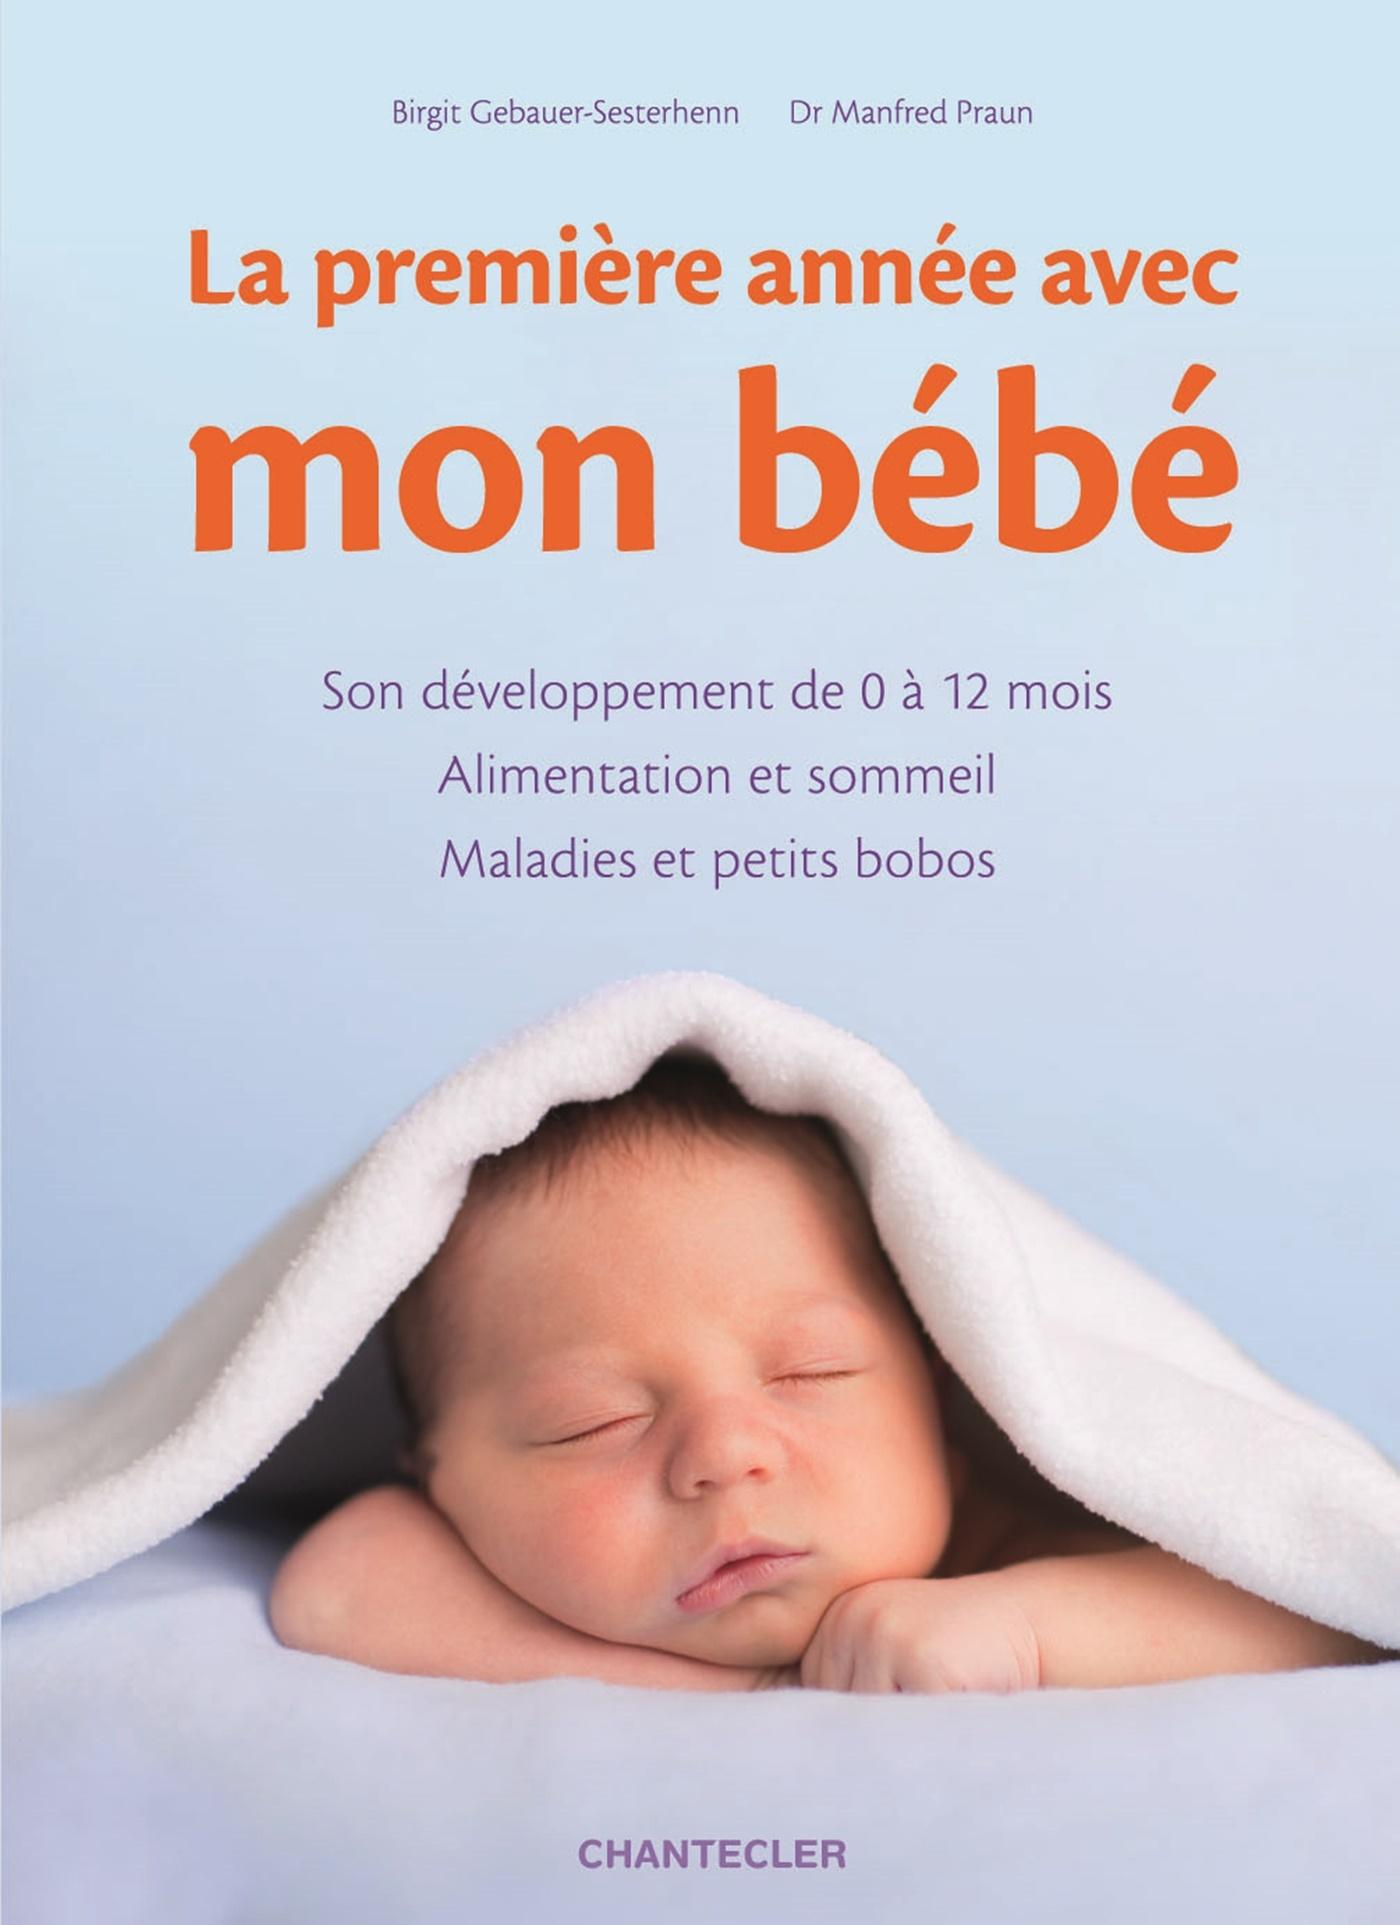 PREMIERE ANNEE AVEC MON BEBE (LA)